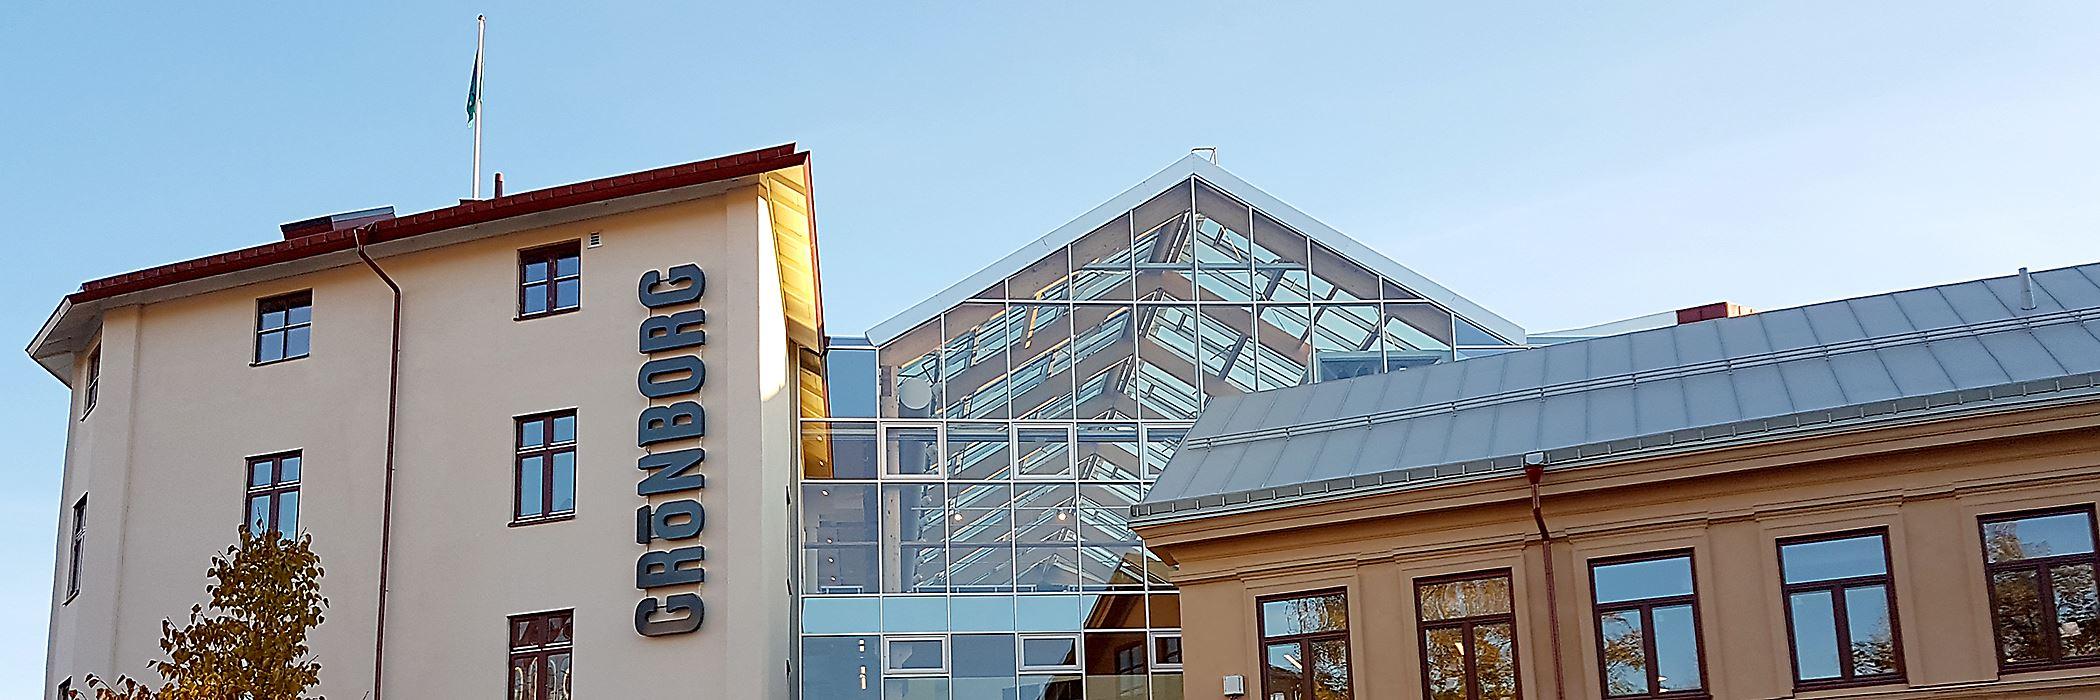 Grönborg